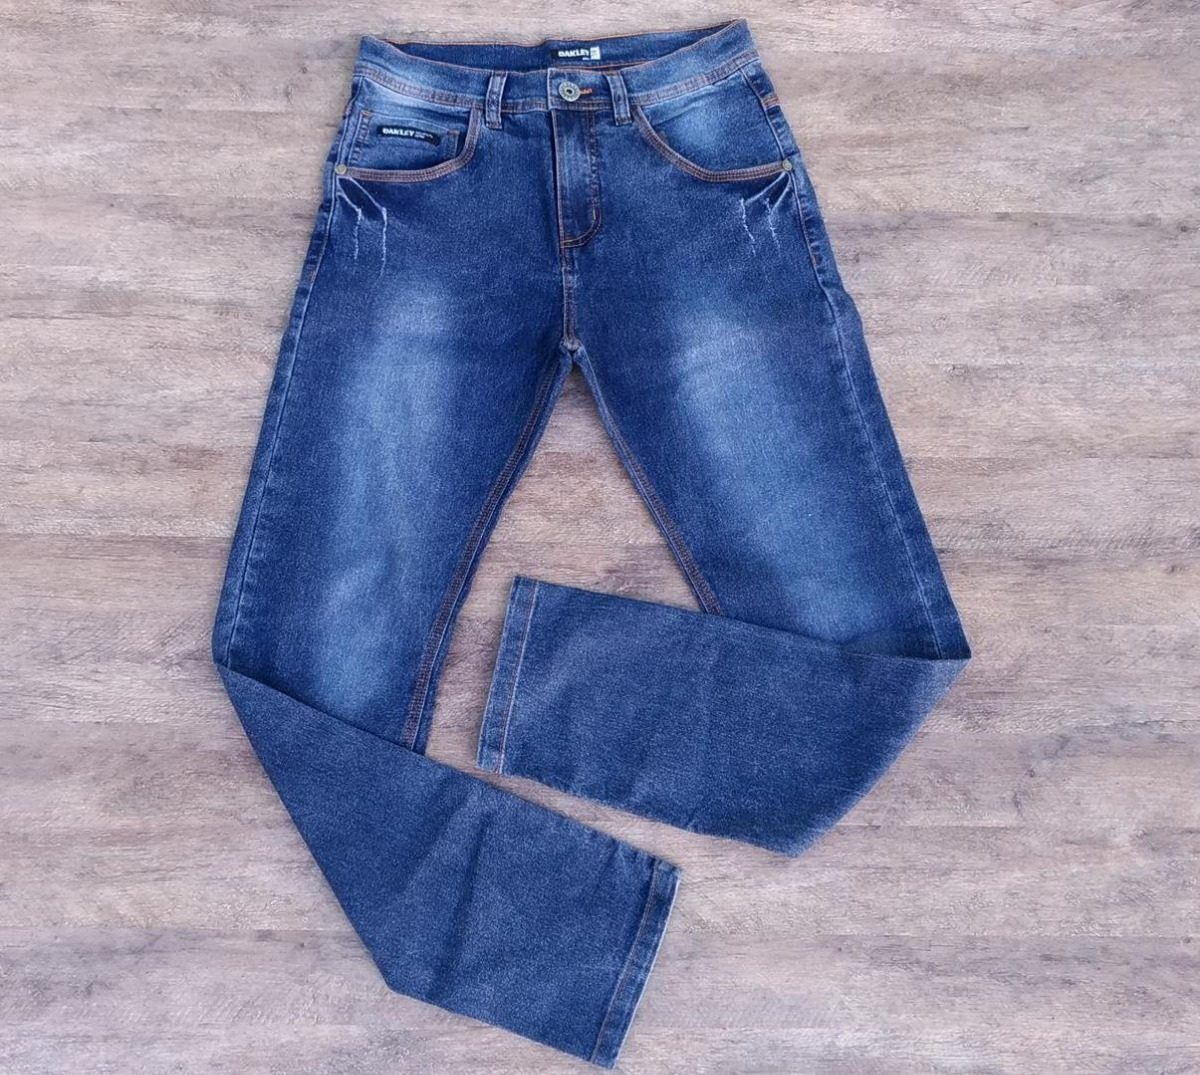 8b6c8617d Calça Jeans Oakley 5 Pockets Masculina Azul - R$ 135,00 em Mercado Livre